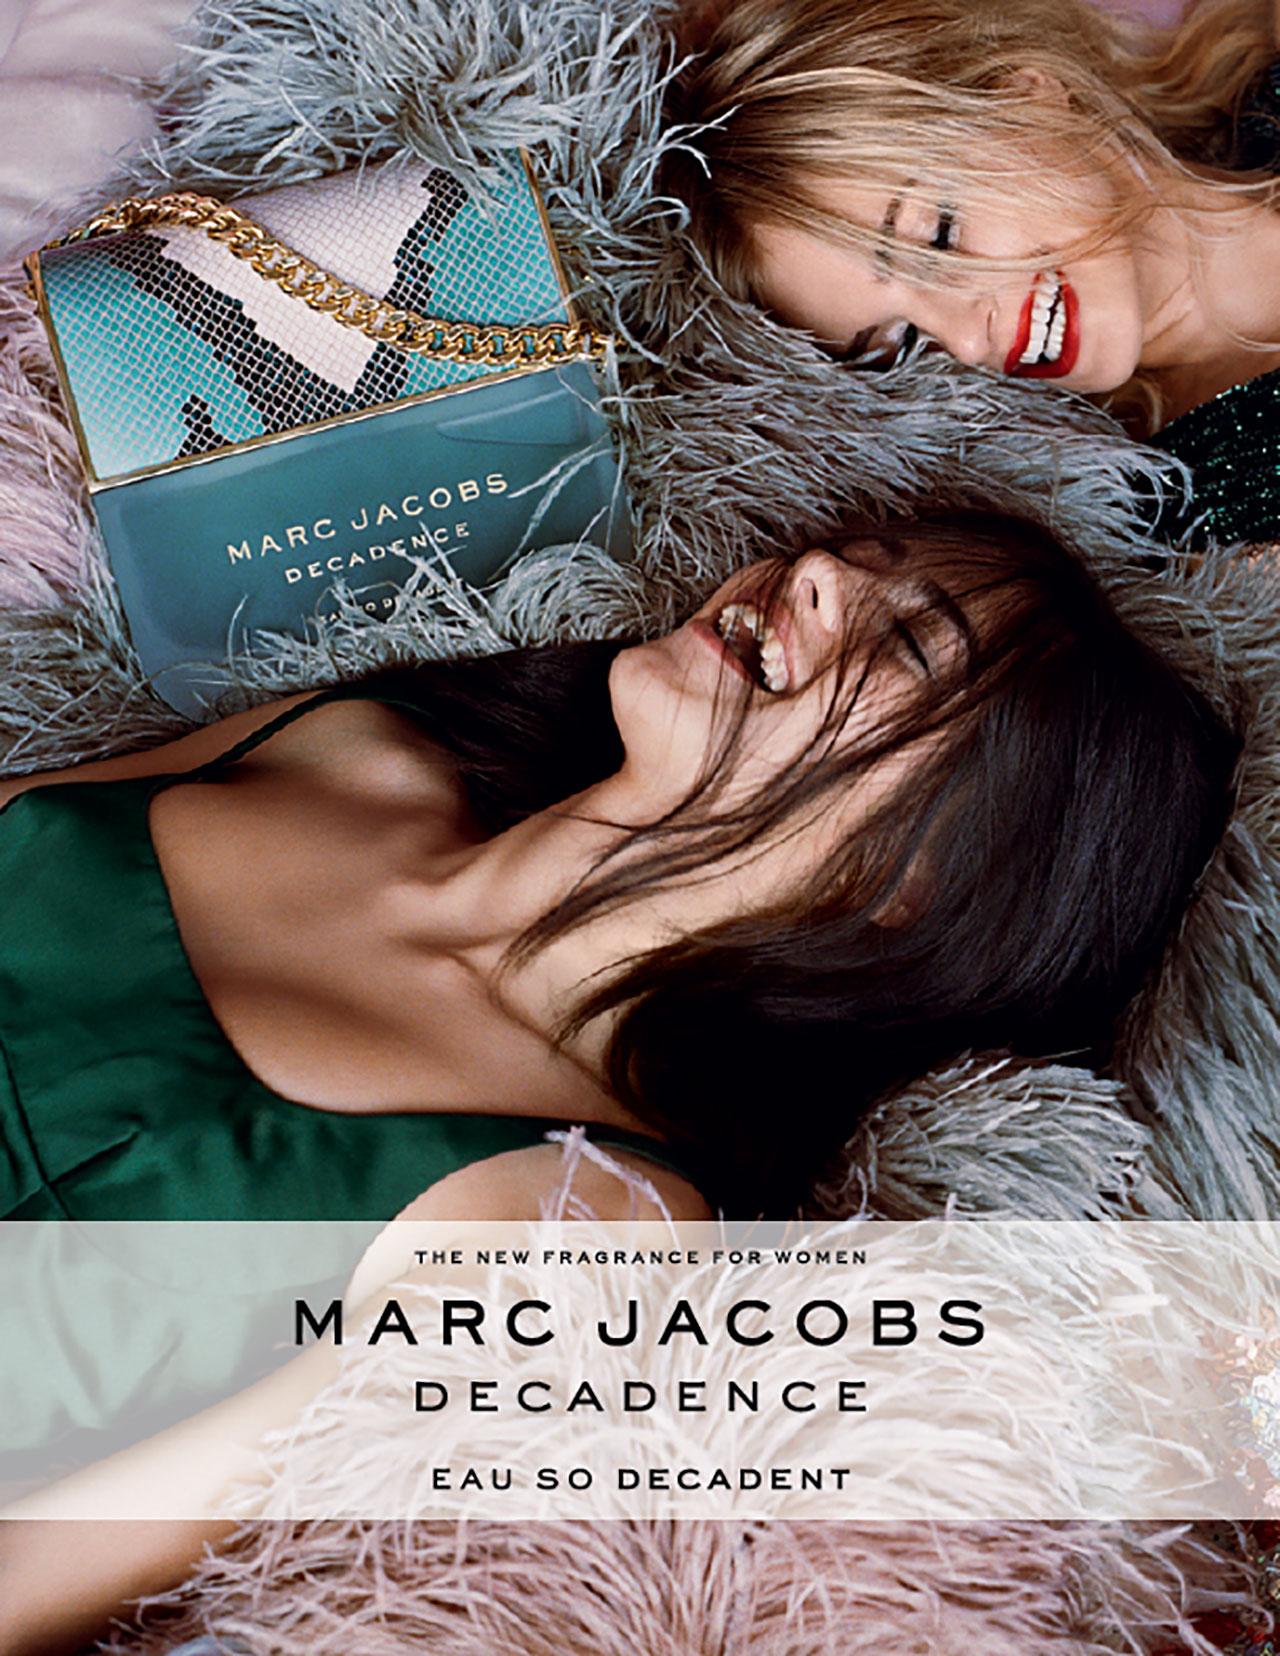 ©︎ Marc Jacobs